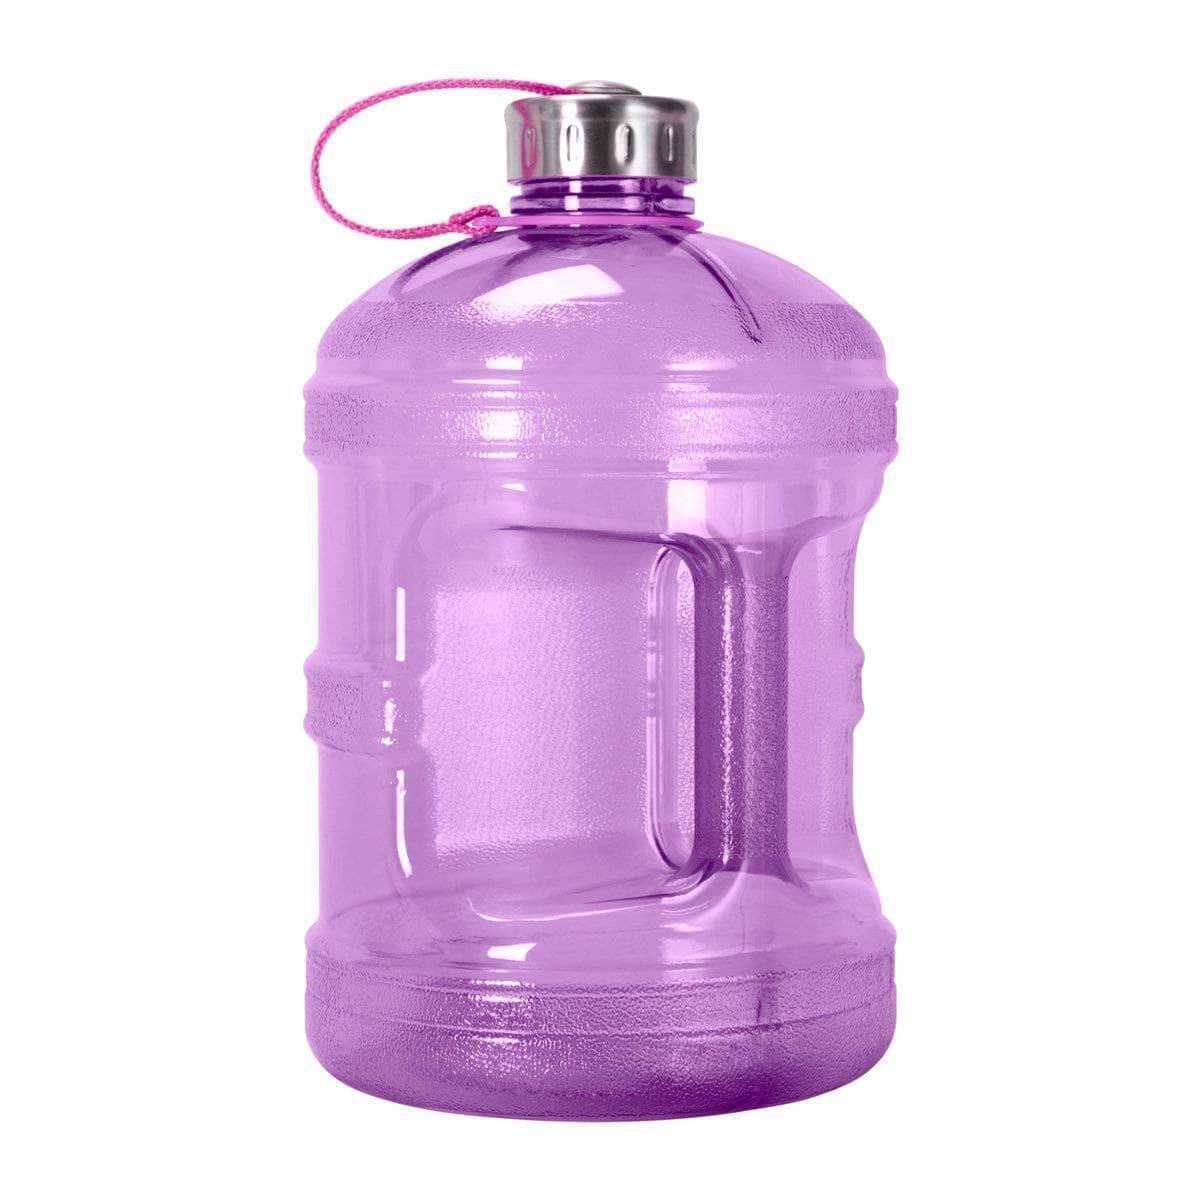 1 Gallon BPA FREE Bottle w/ Stainless Steel Cap